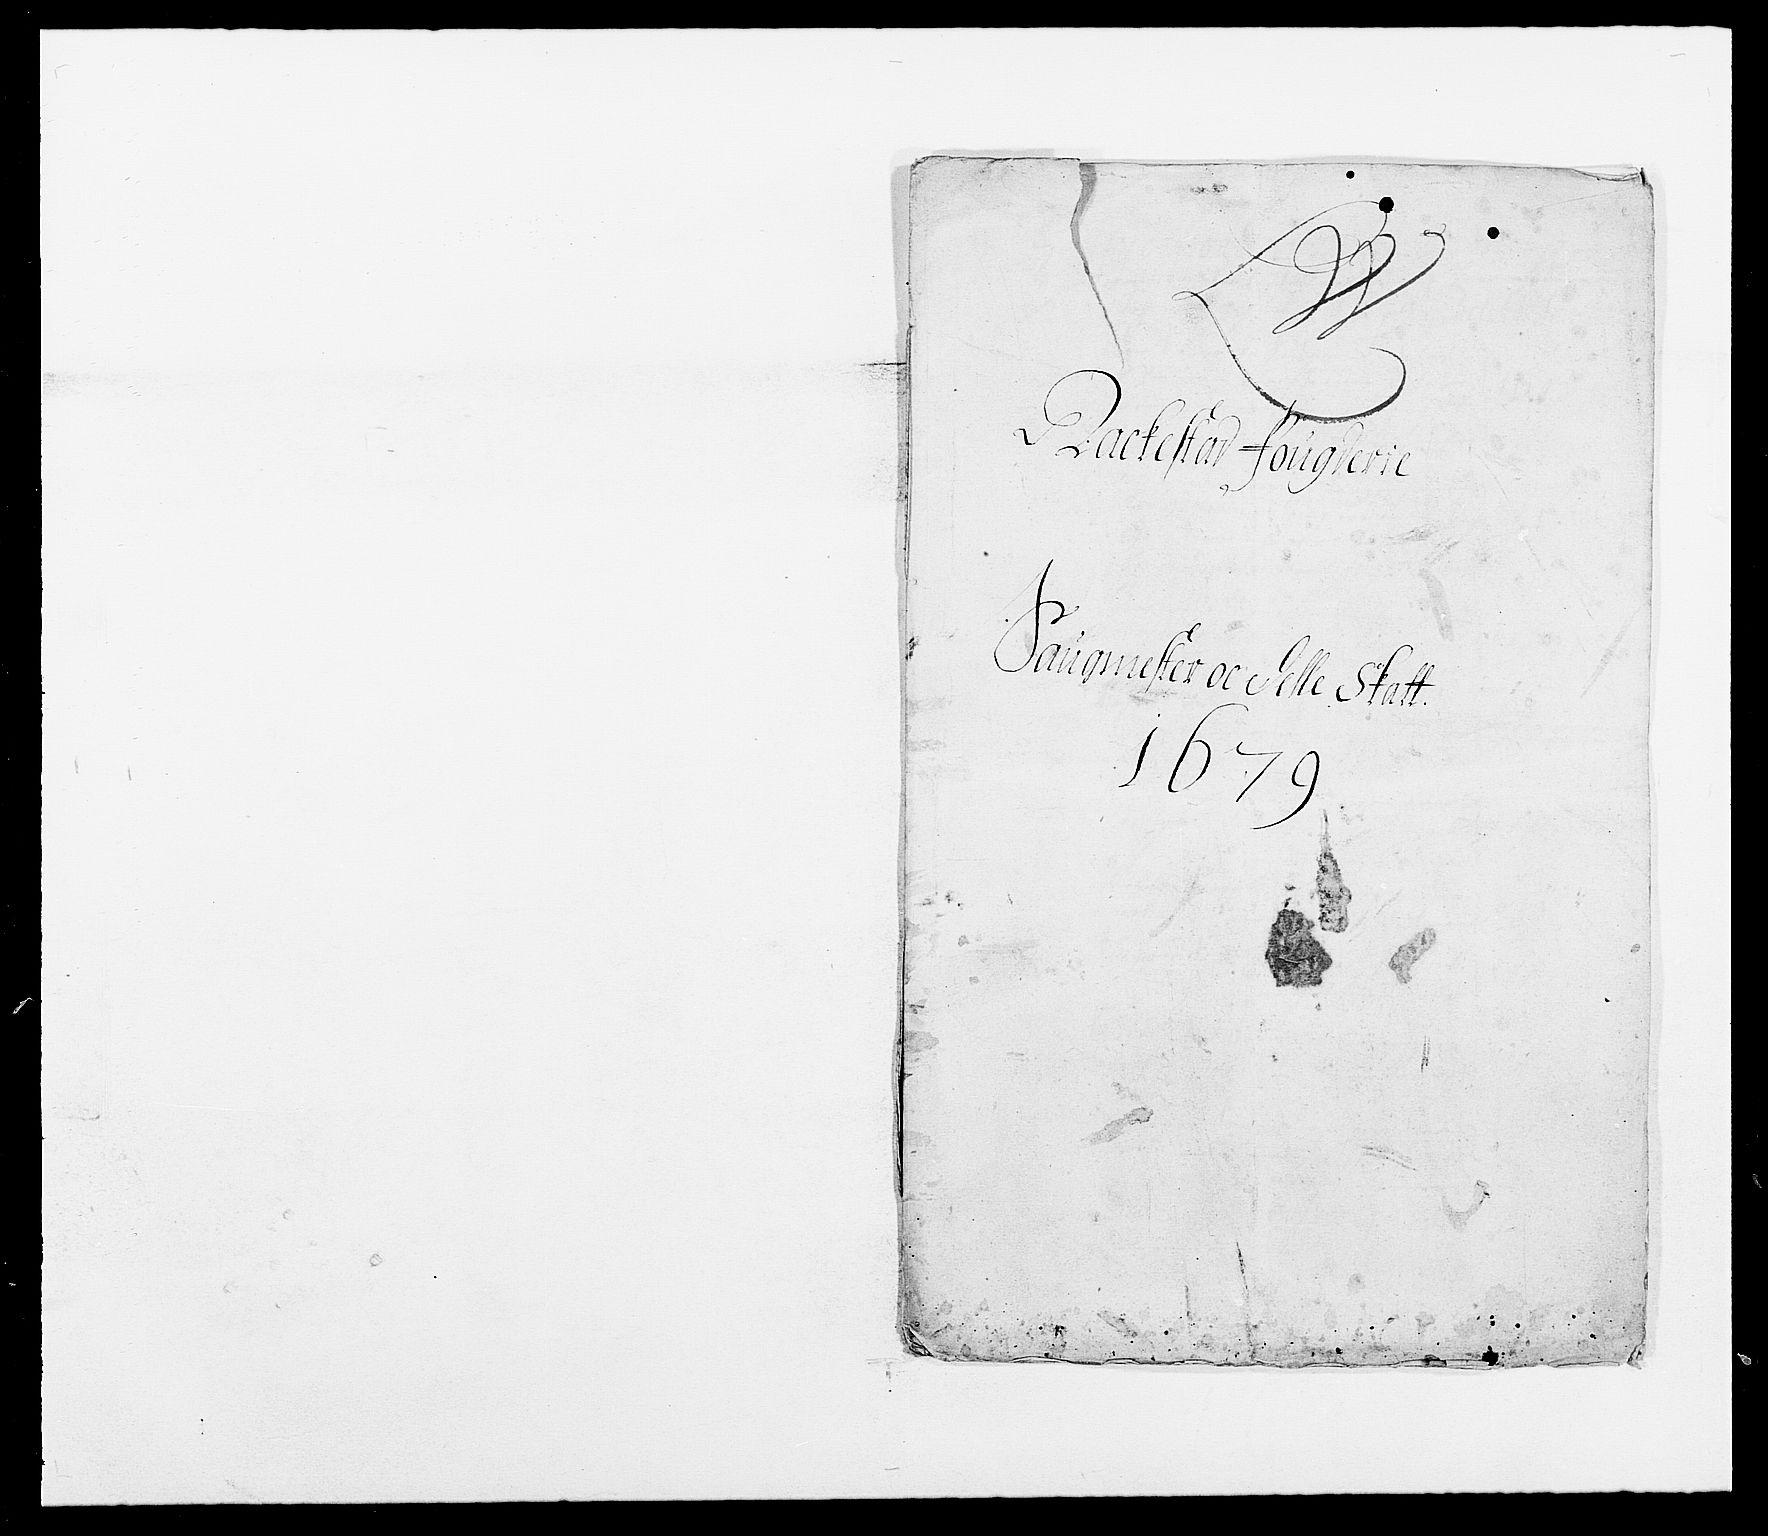 RA, Rentekammeret inntil 1814, Reviderte regnskaper, Fogderegnskap, R05/L0271: Fogderegnskap Rakkestad, 1678-1679, s. 485